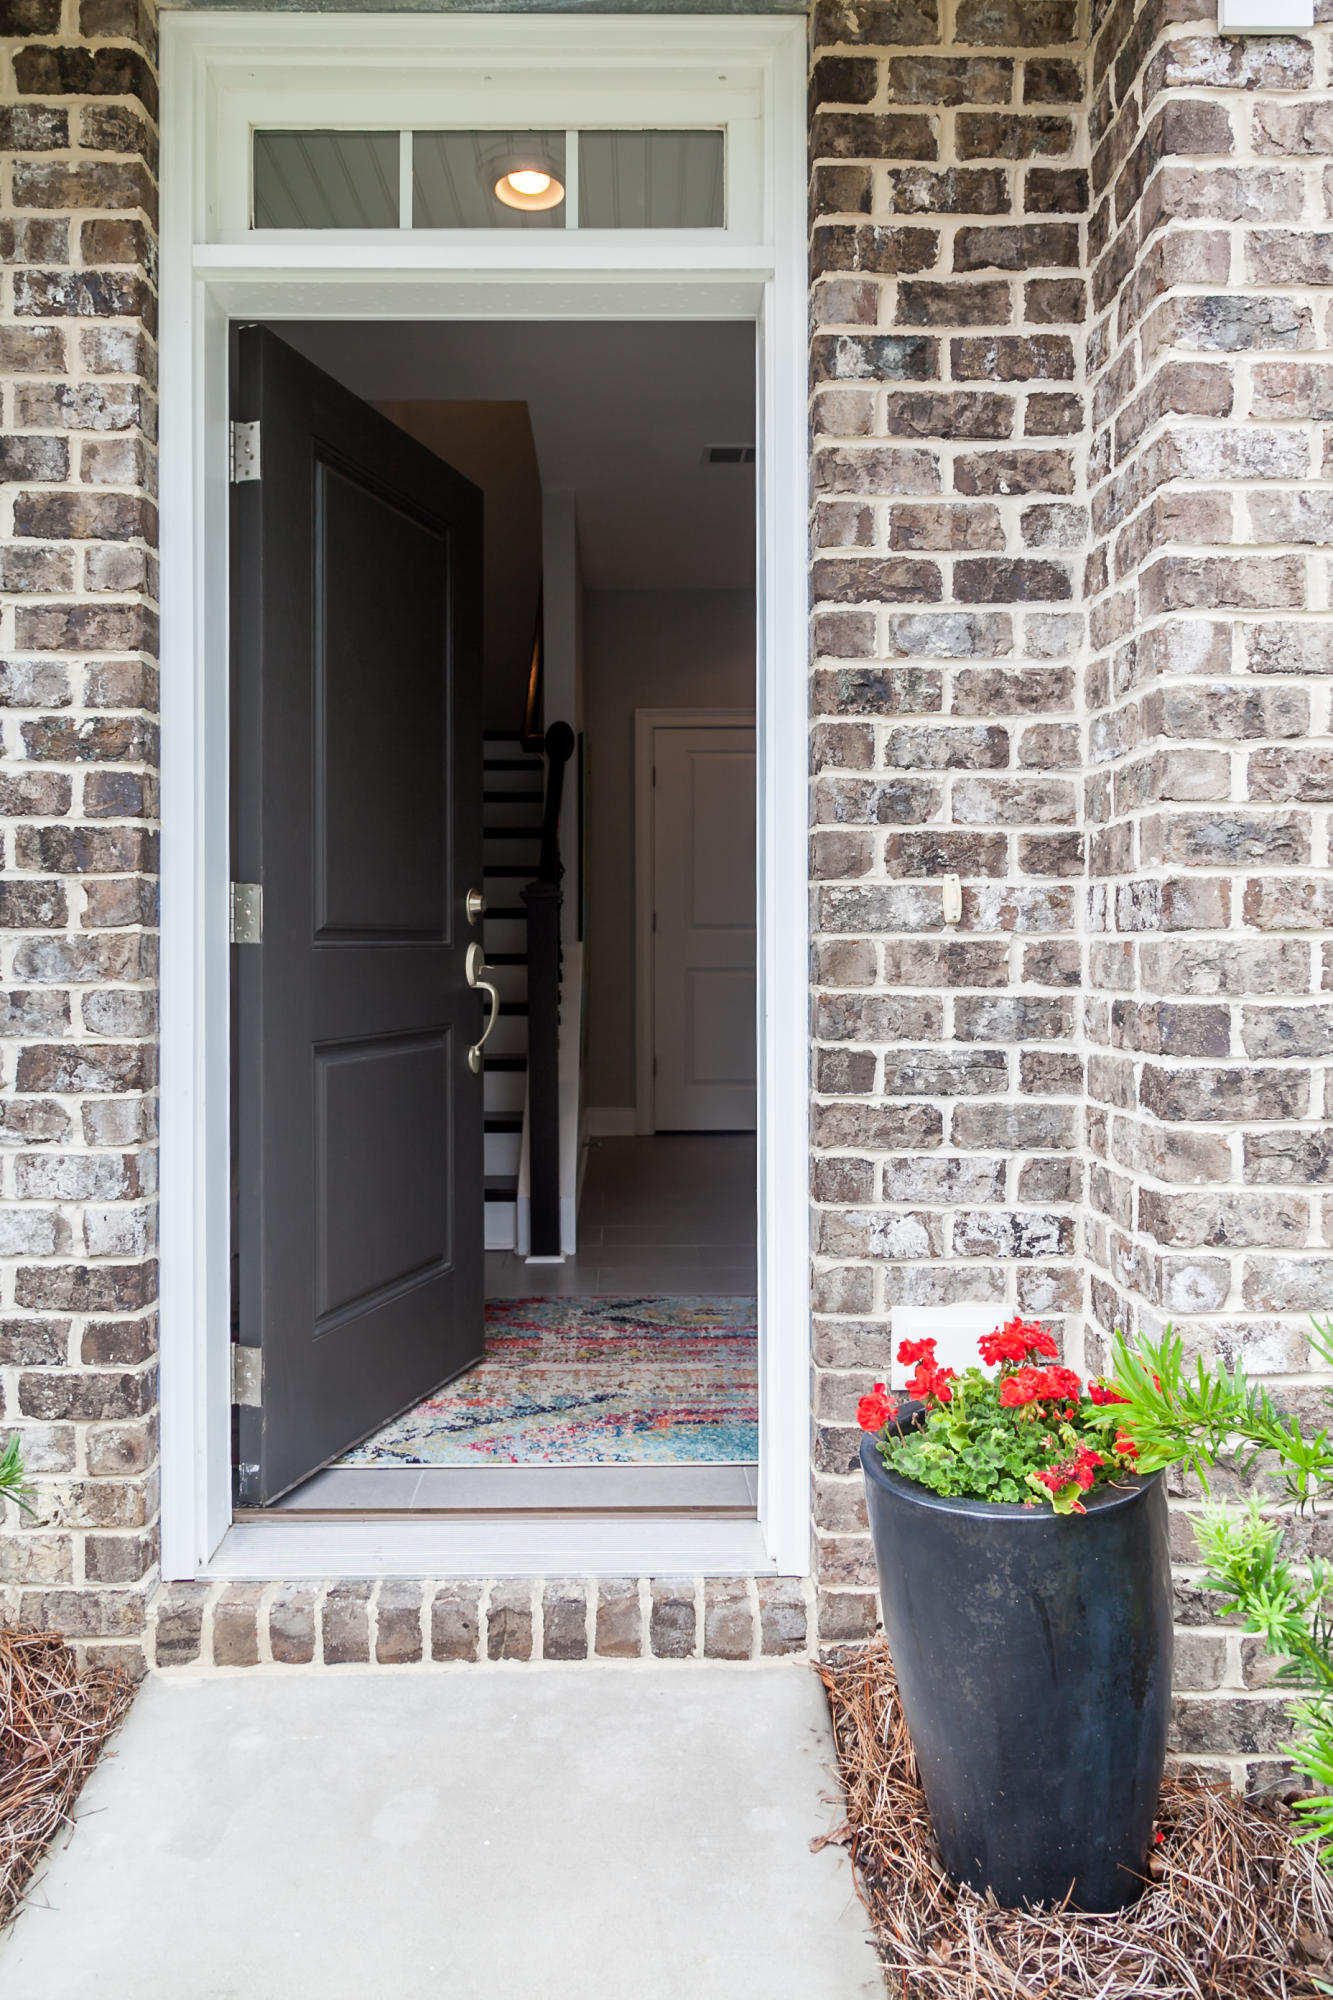 Whitesides Park Homes For Sale - 1319 Myrick, Mount Pleasant, SC - 4